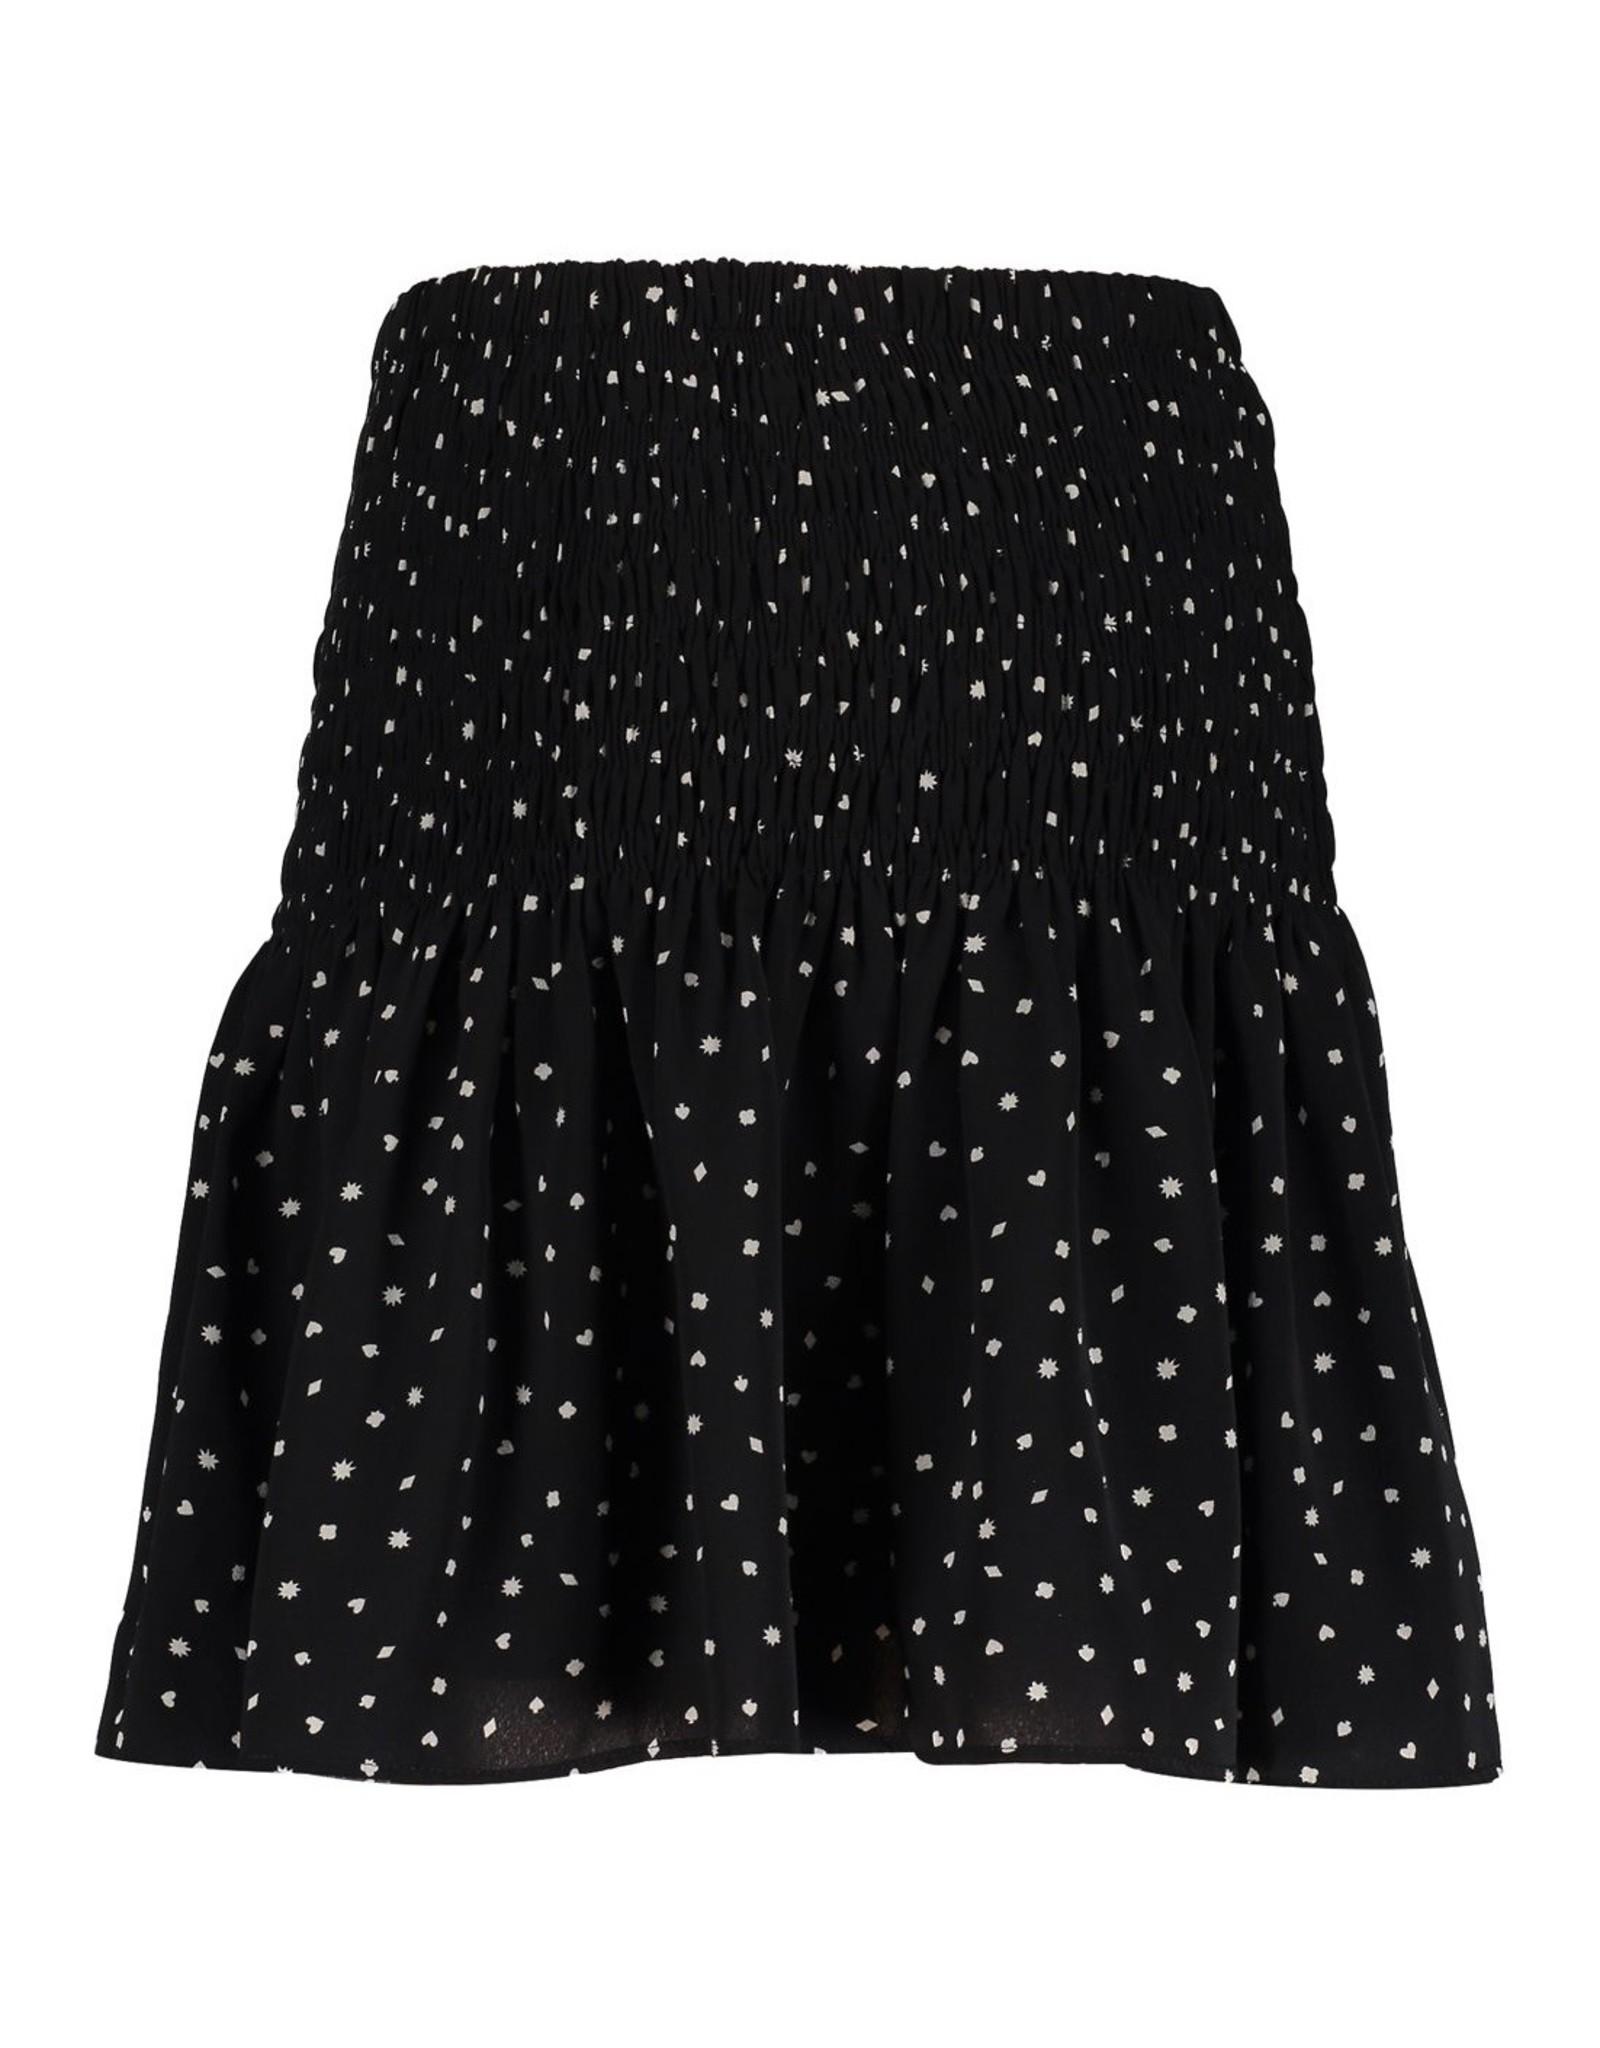 Frankie & Liberty Aliyaah Skirt